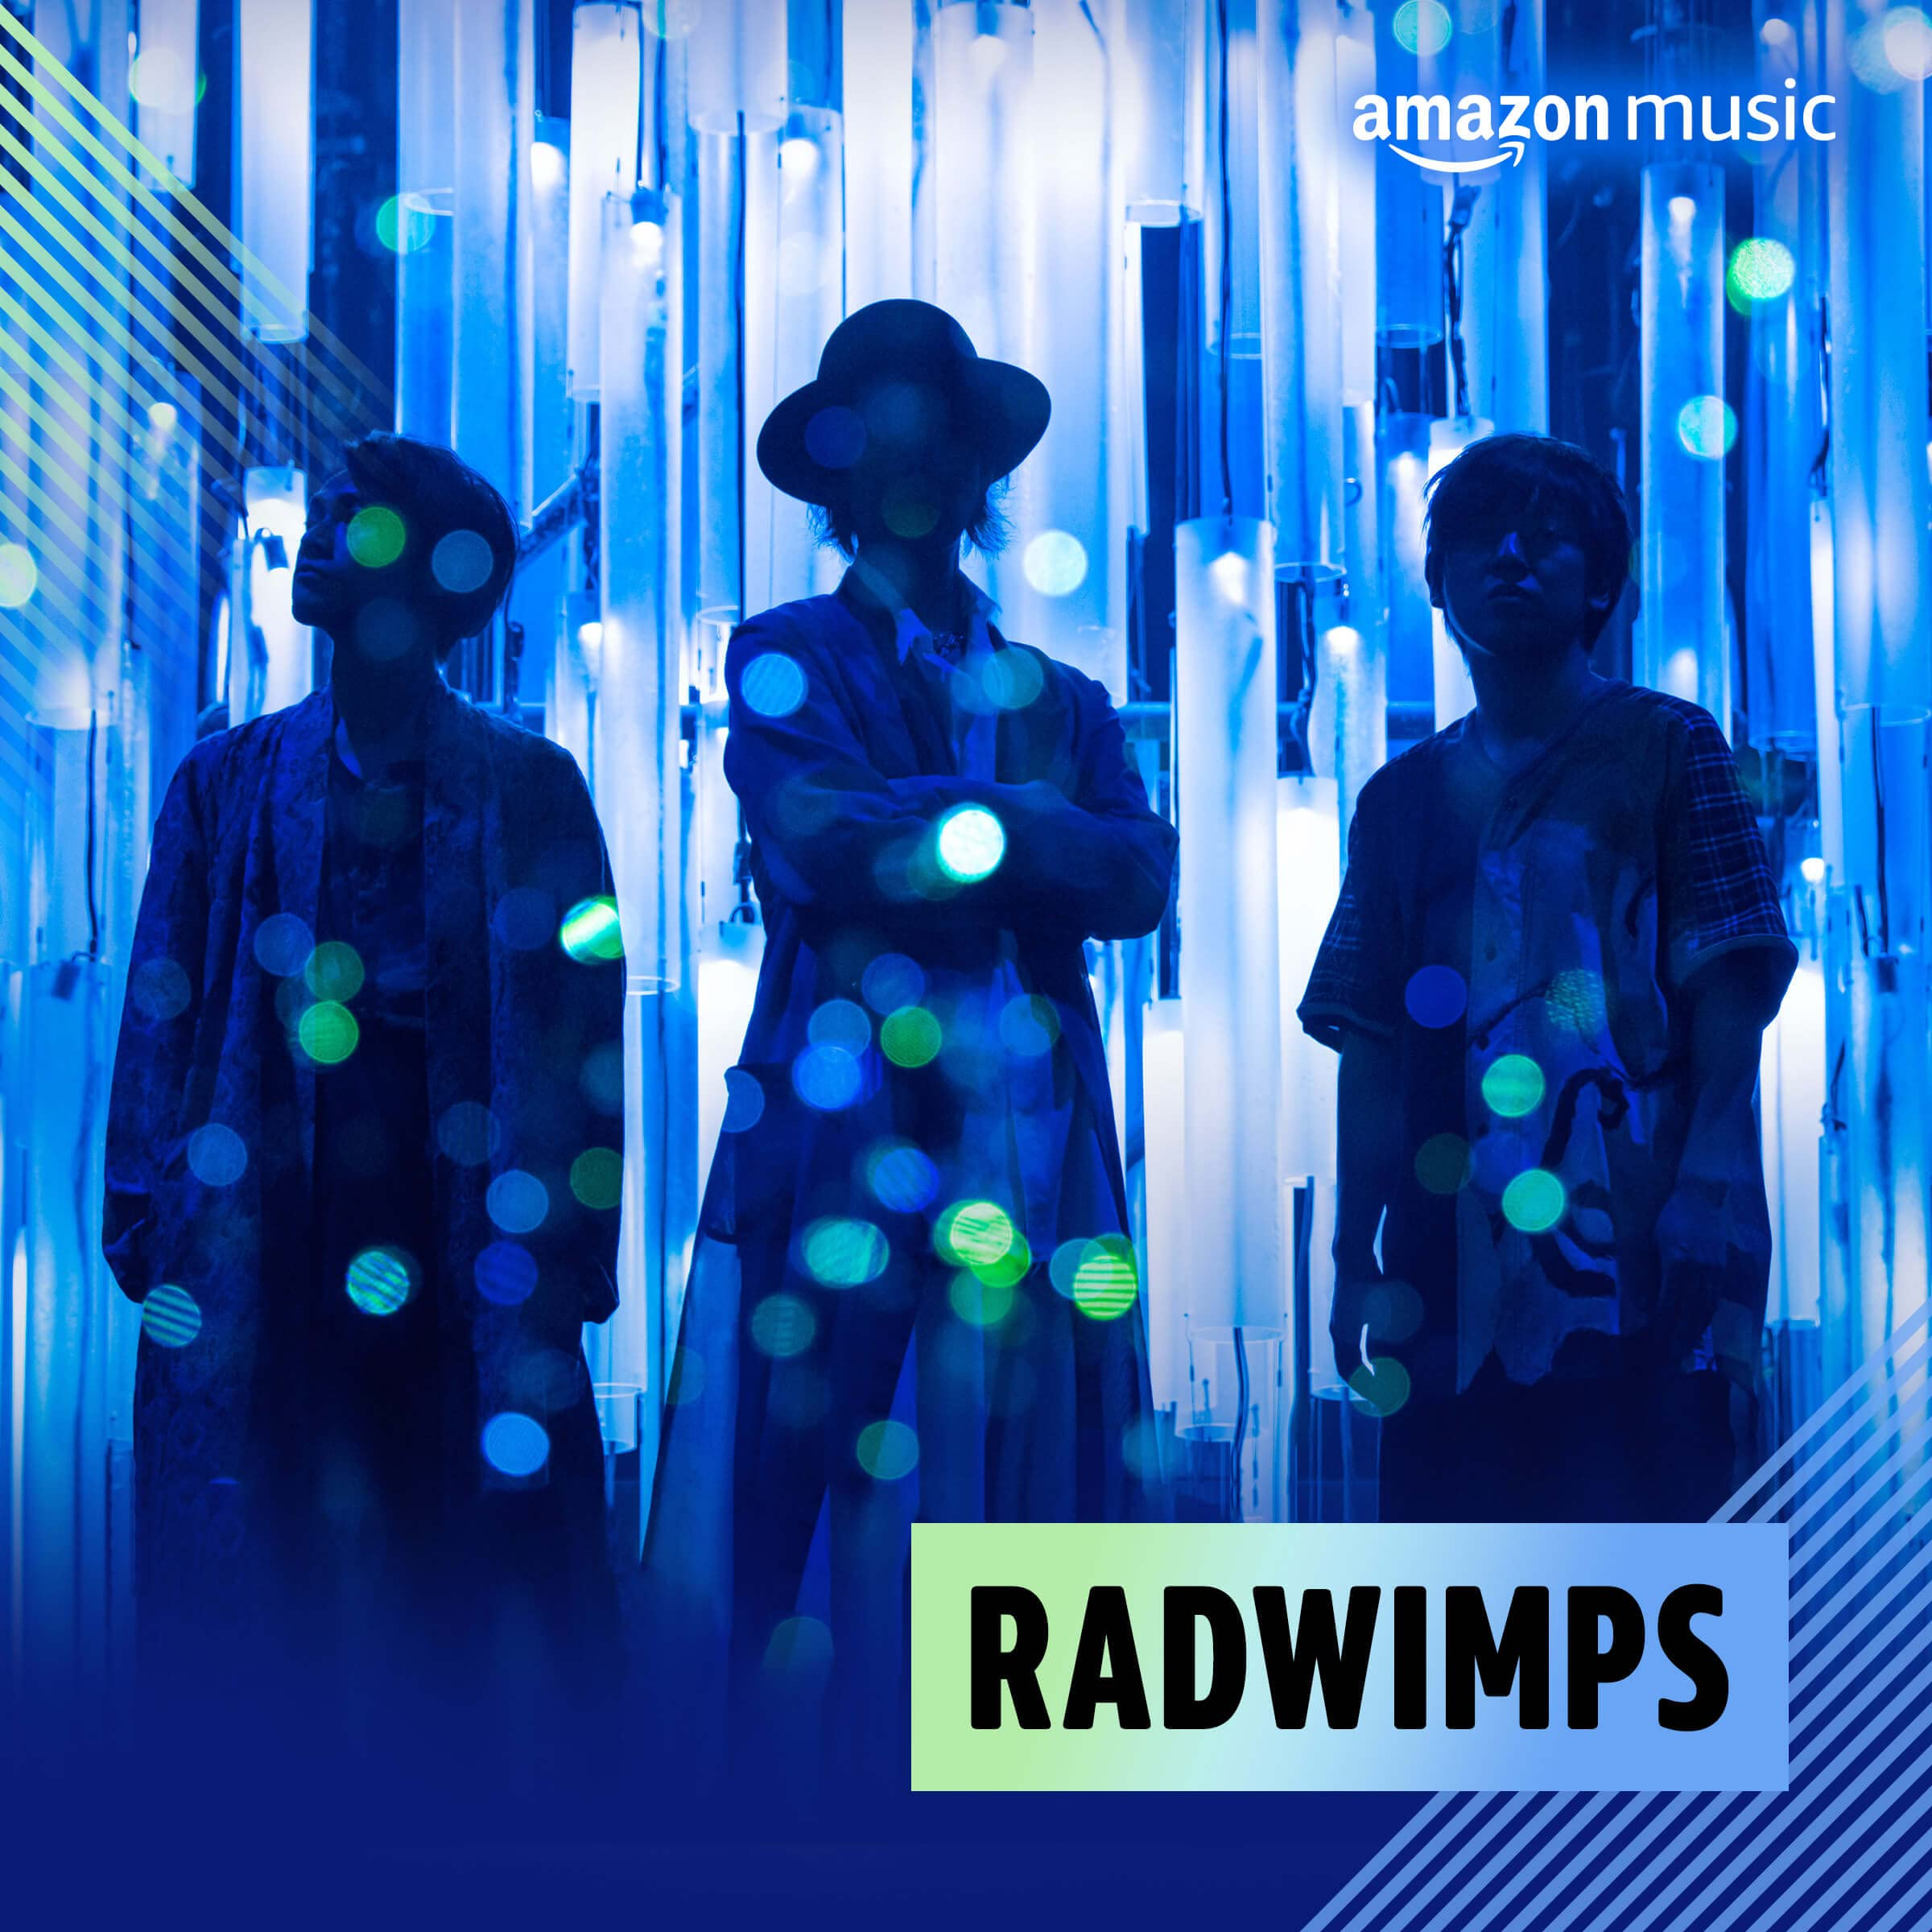 RADWIMPSを聴いているお客様におすすめ